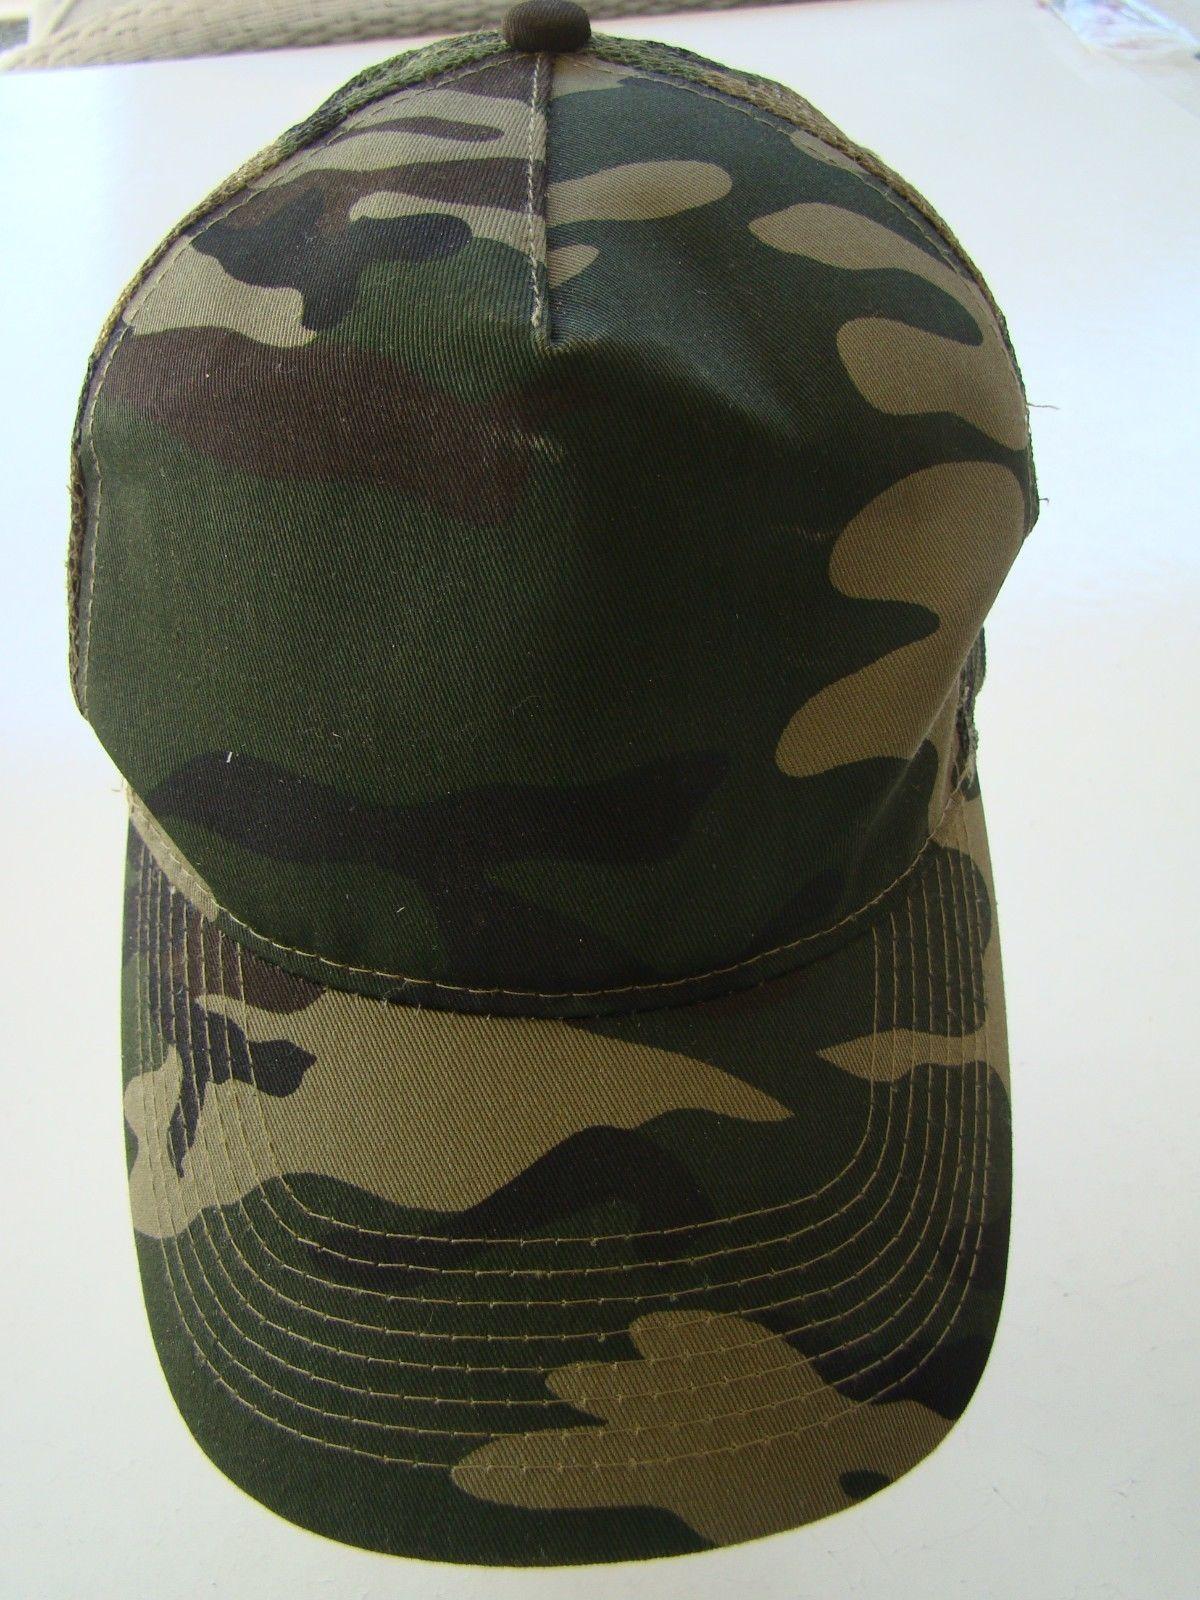 USAF  AIR FORCE PILOT AIR GROUND CREW WOODLAND BDU BALL CAP BALLCAP HAT ALL UNIT